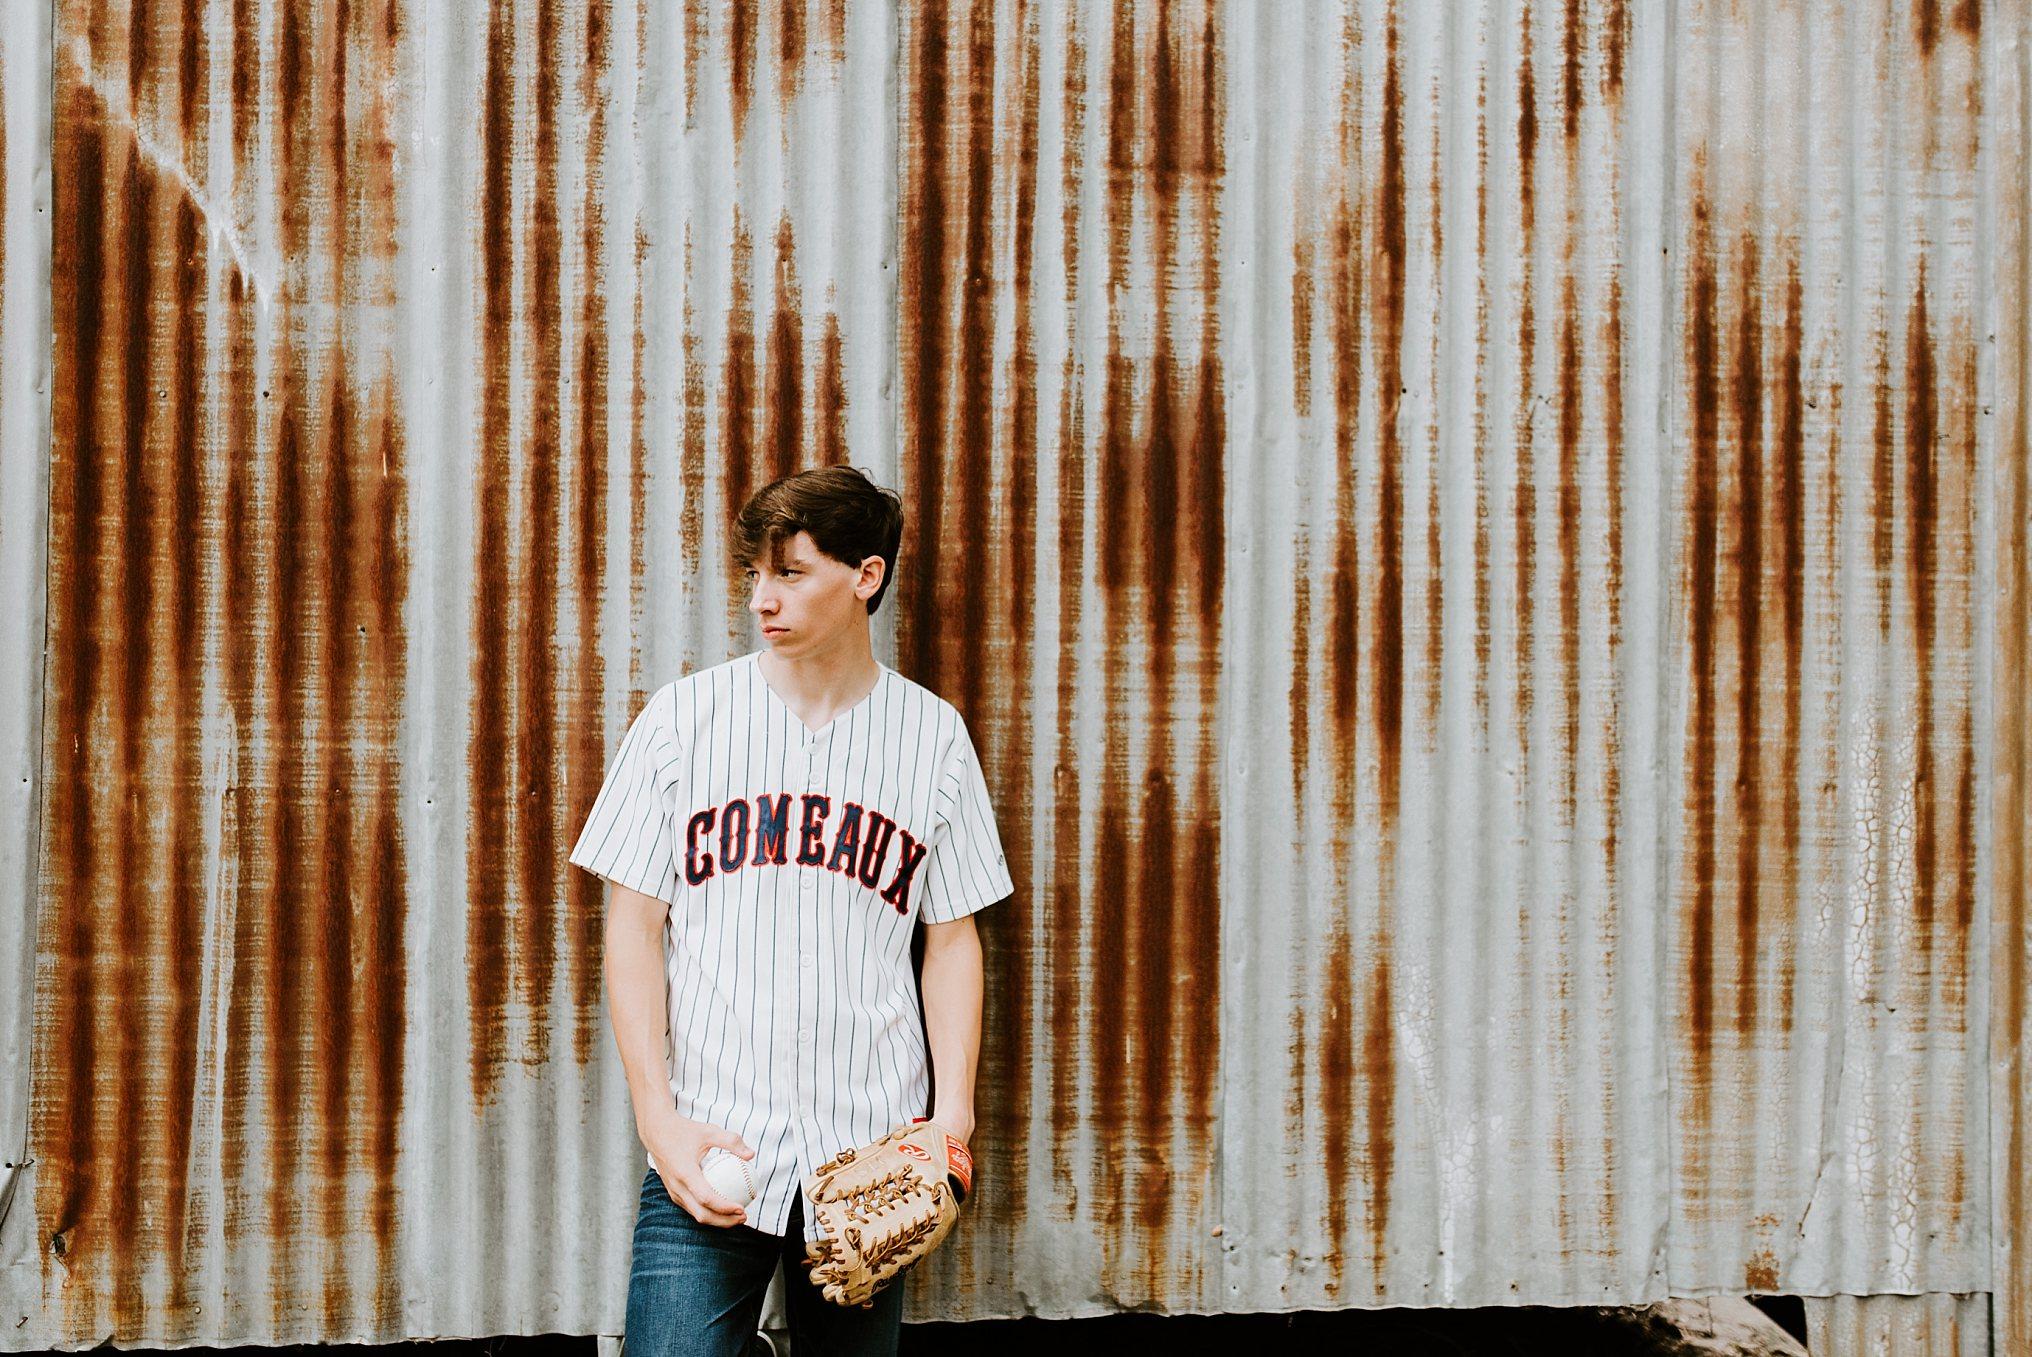 senior buy baseball image